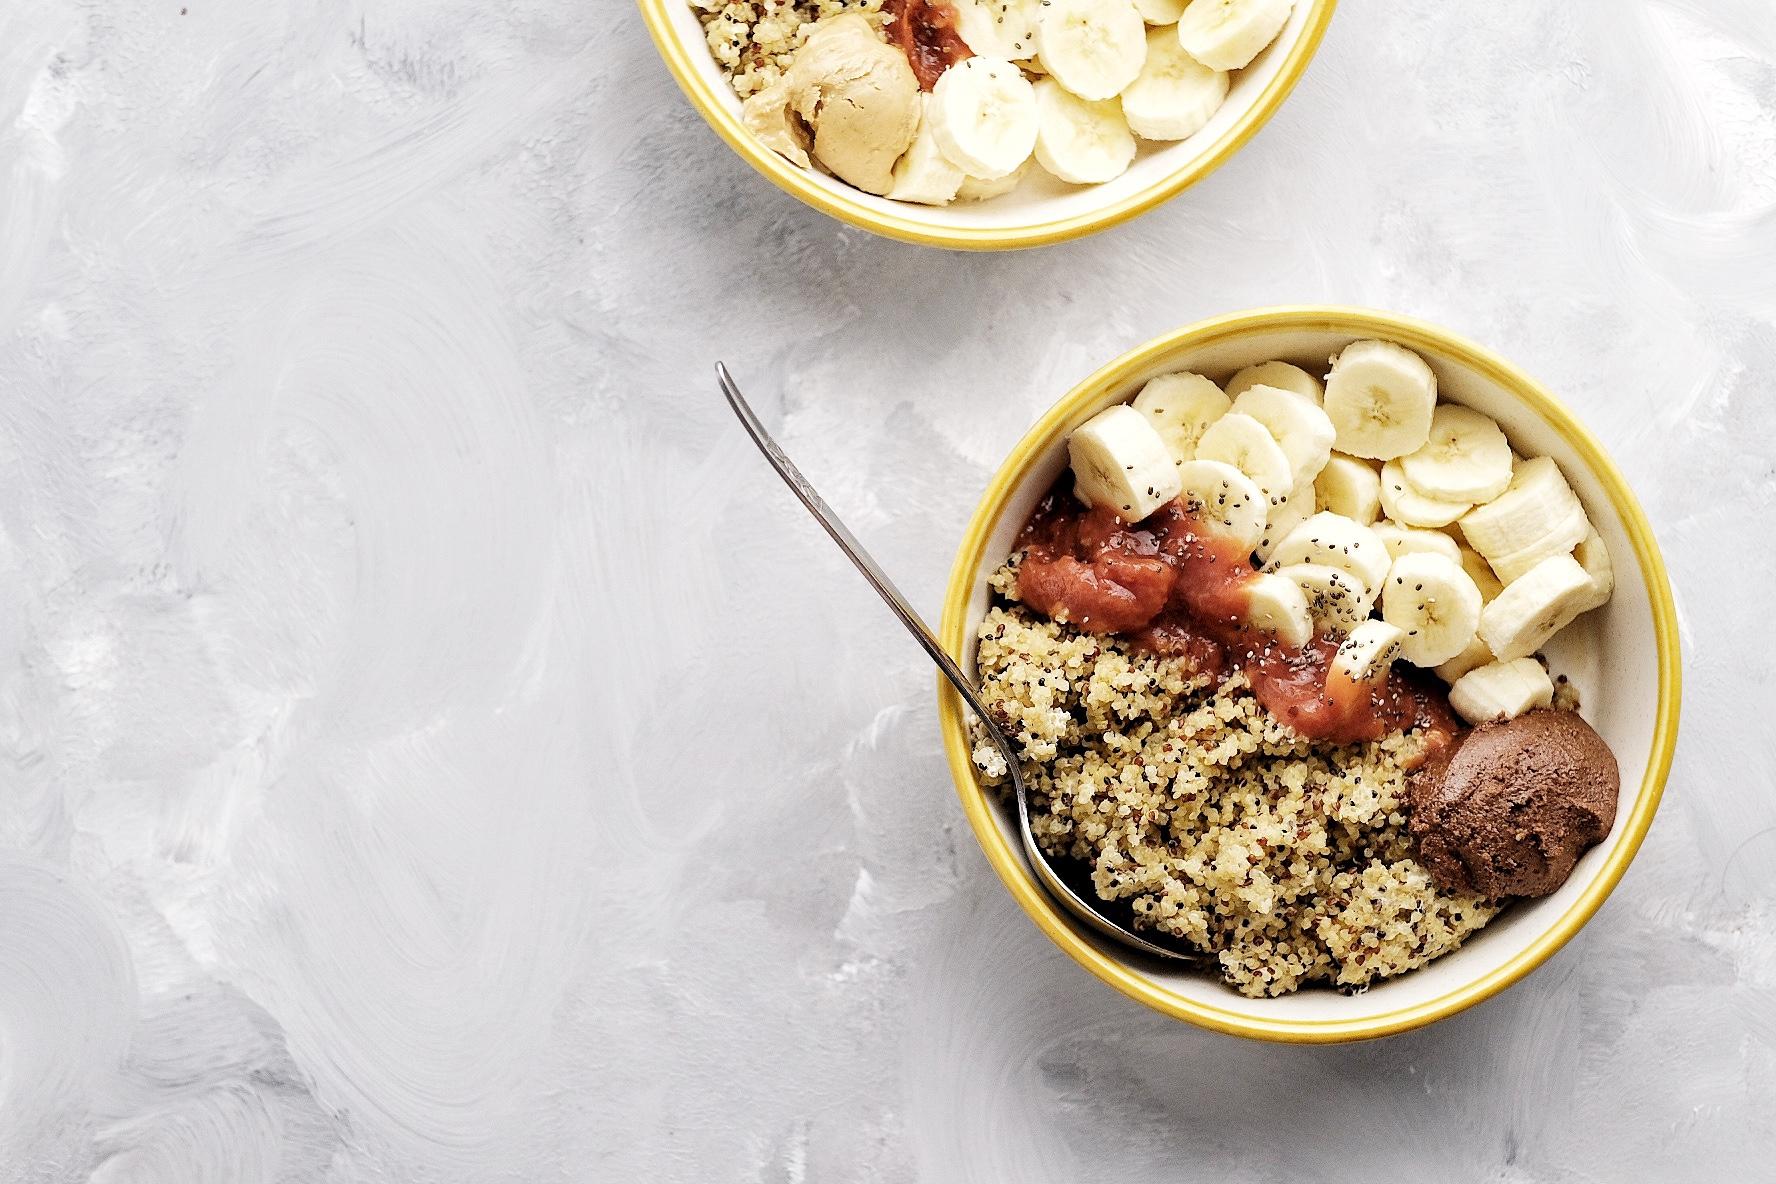 Mic dejun cu quinoa si banane